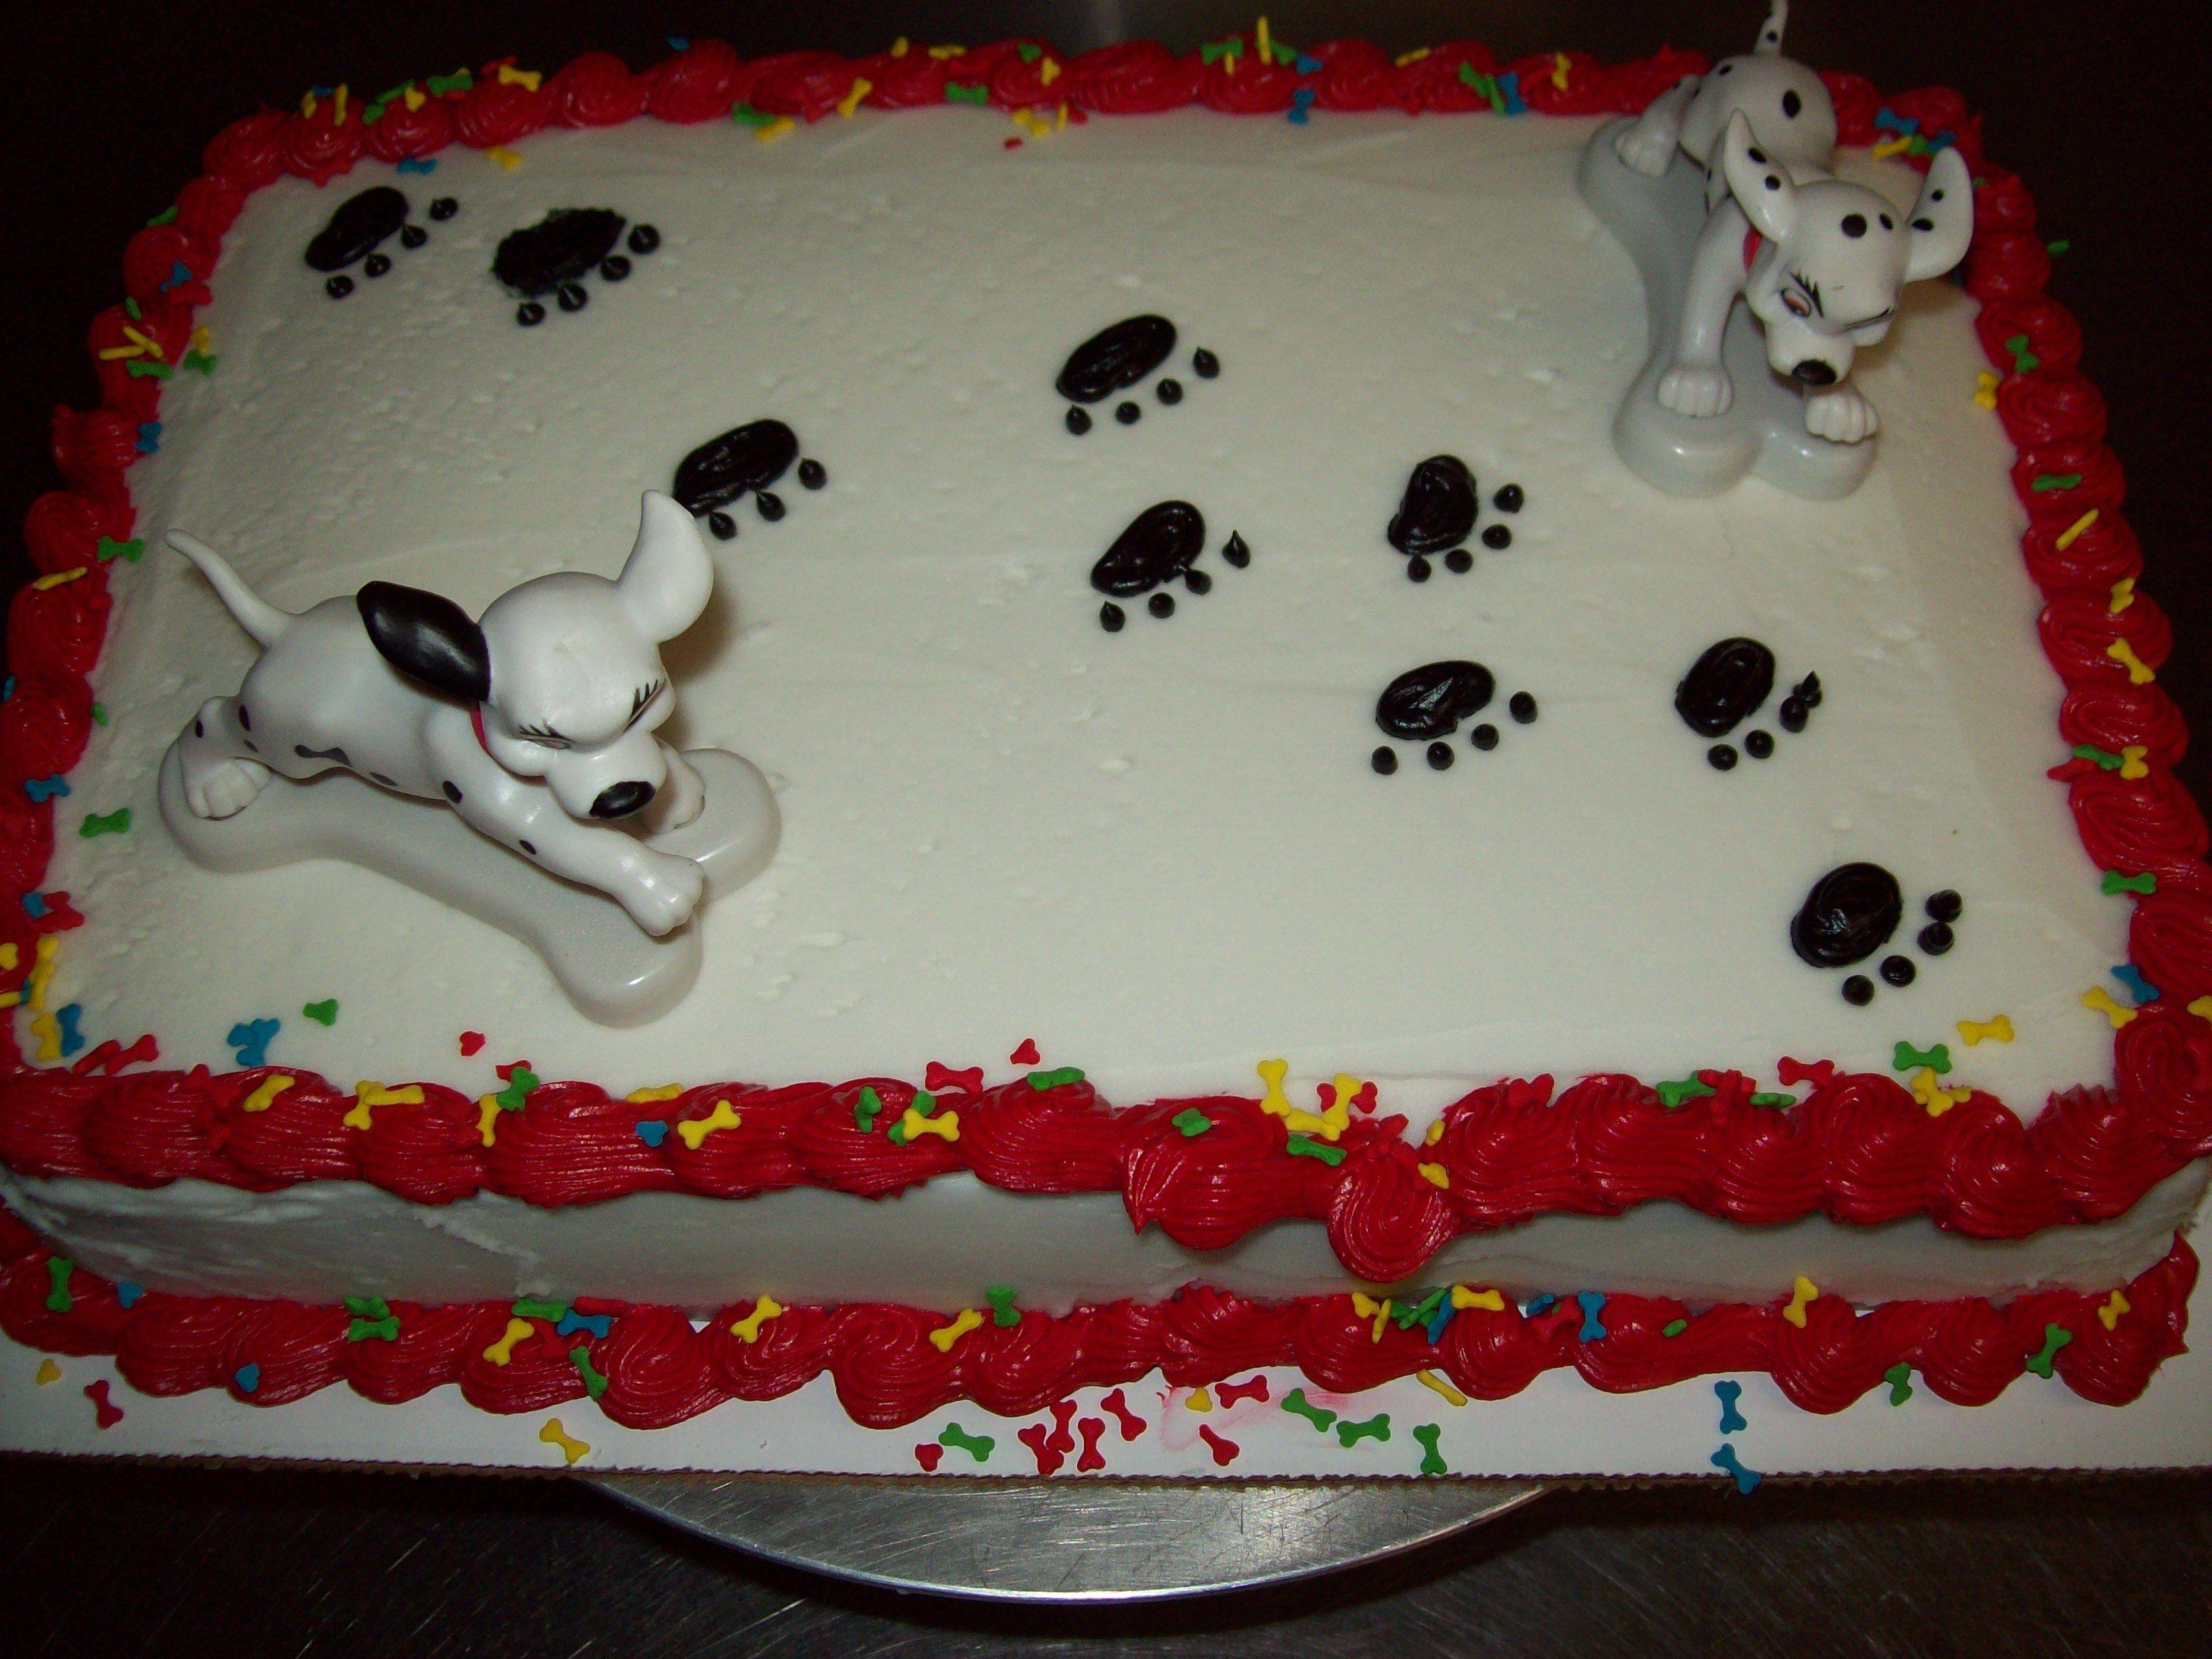 101 dalmation cake